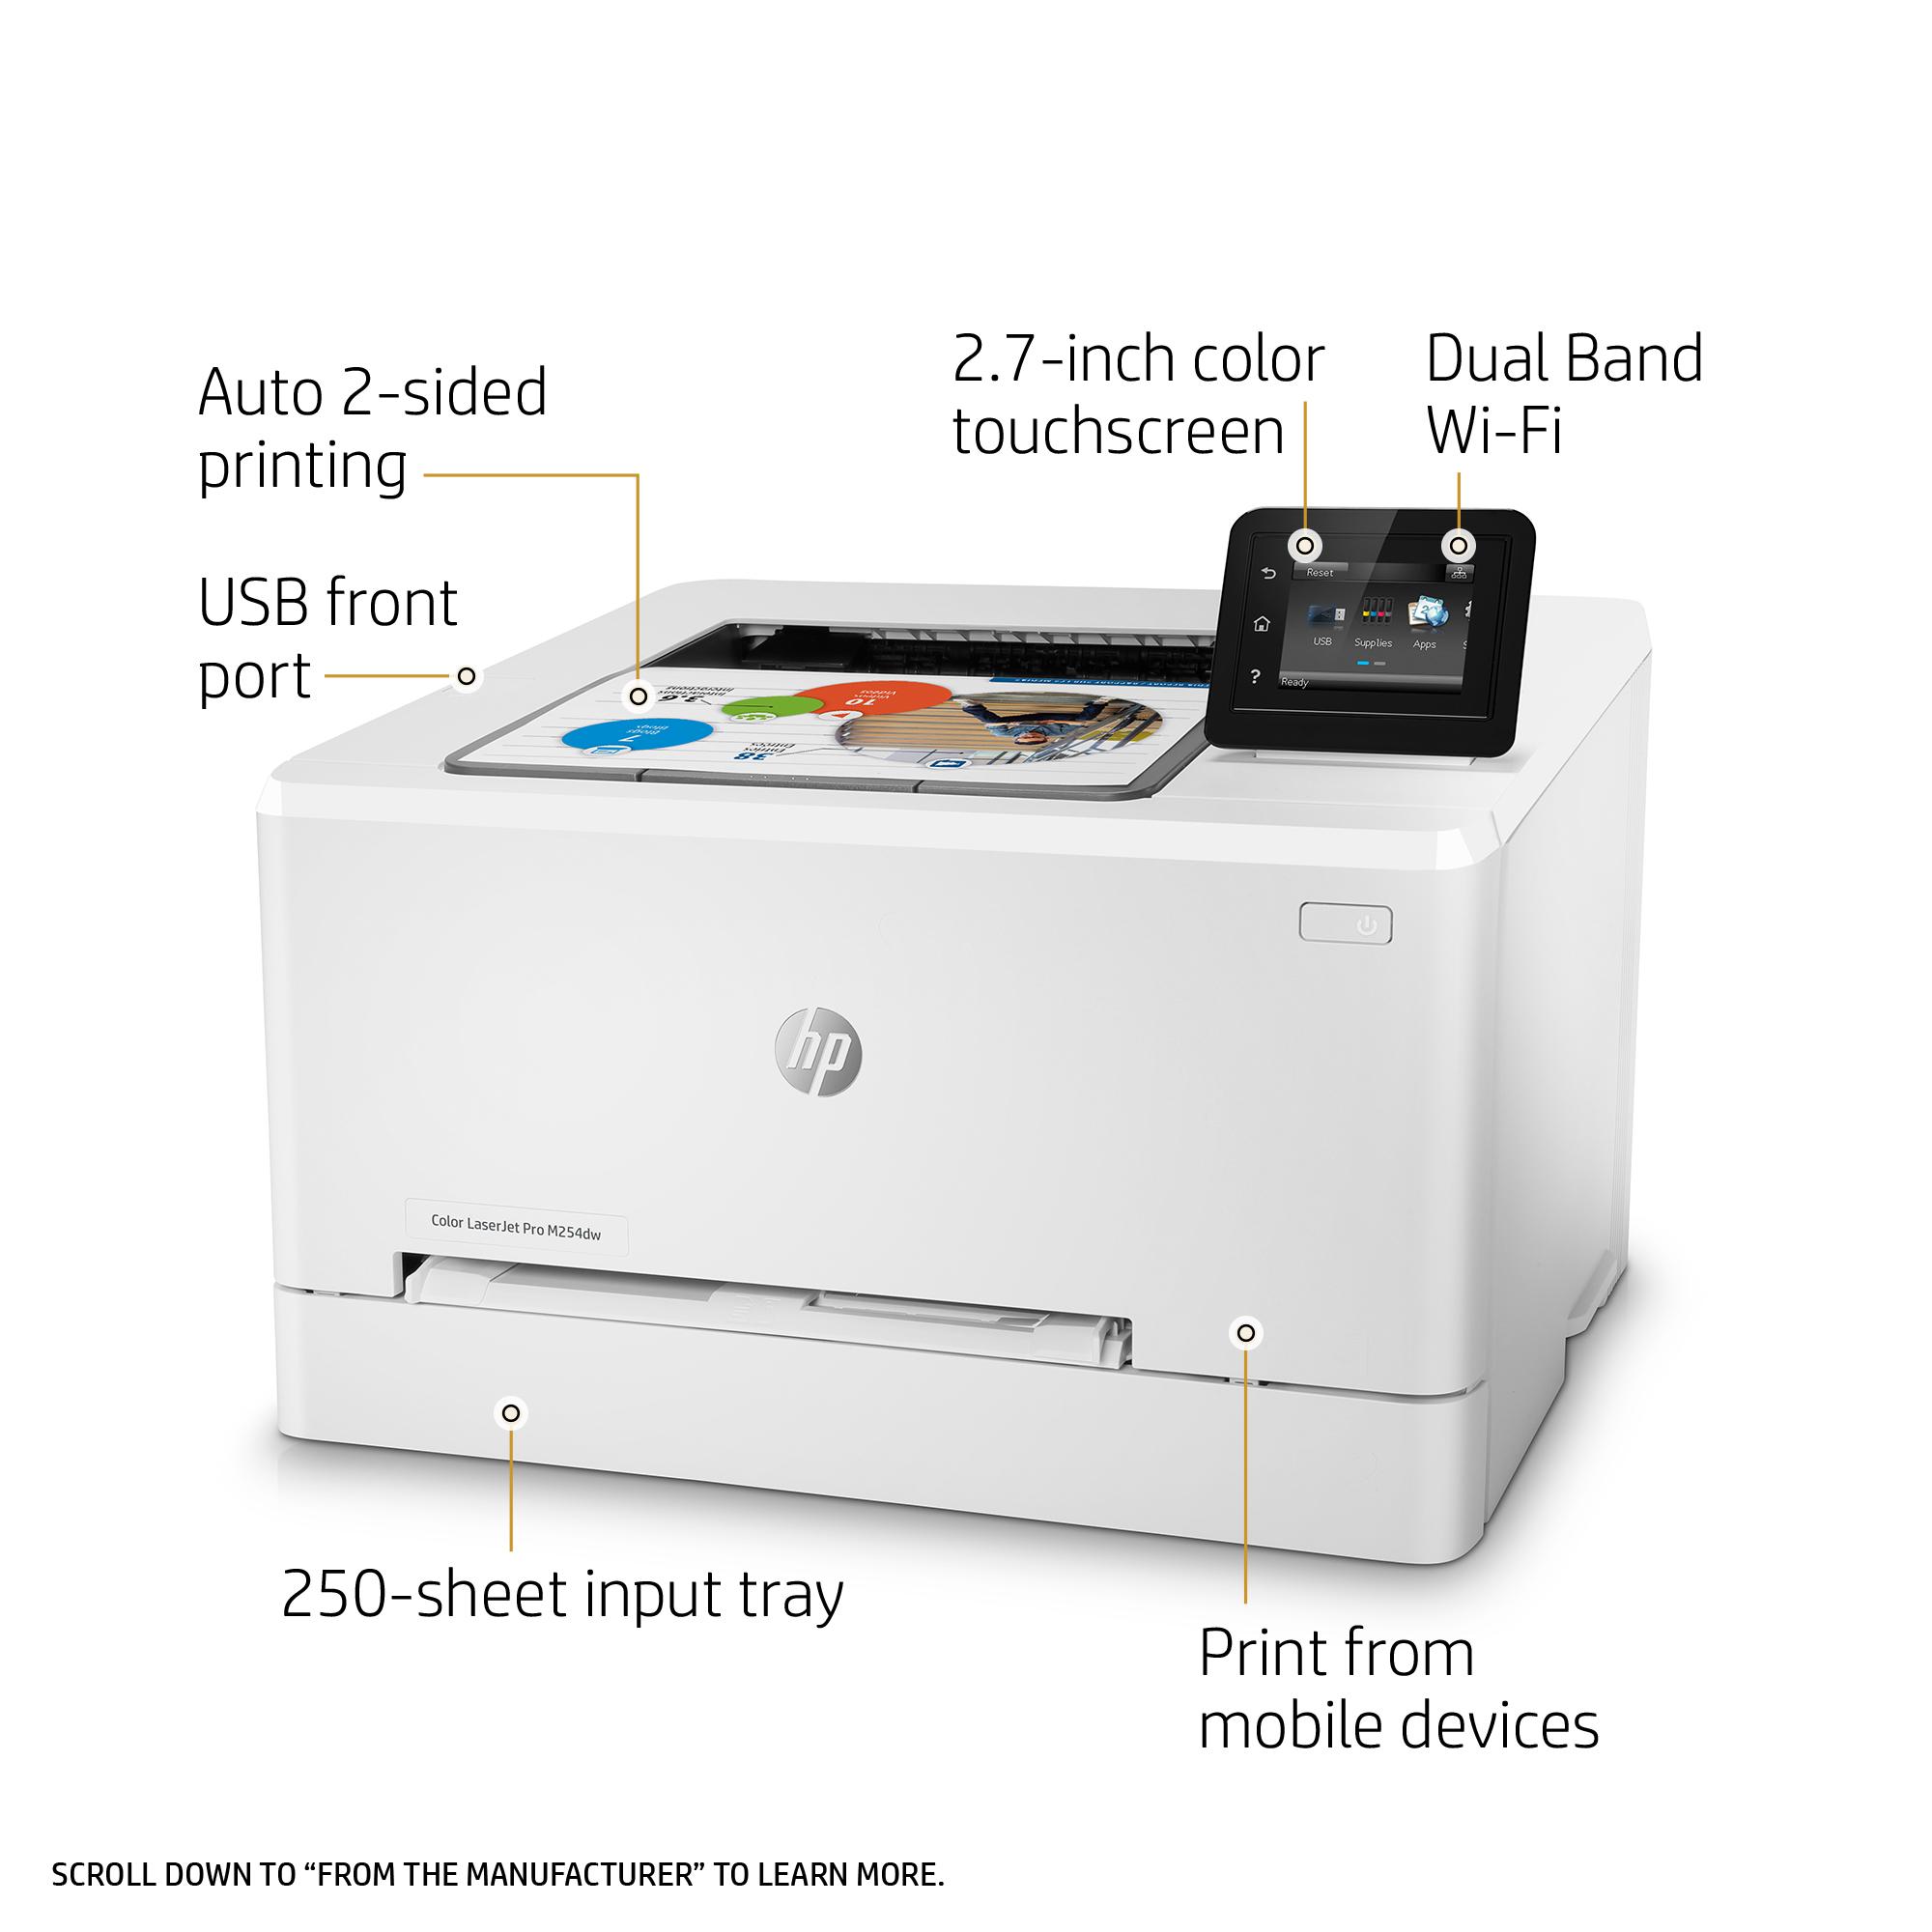 HP Color LaserJet Pro M254dw - printer - color - laser